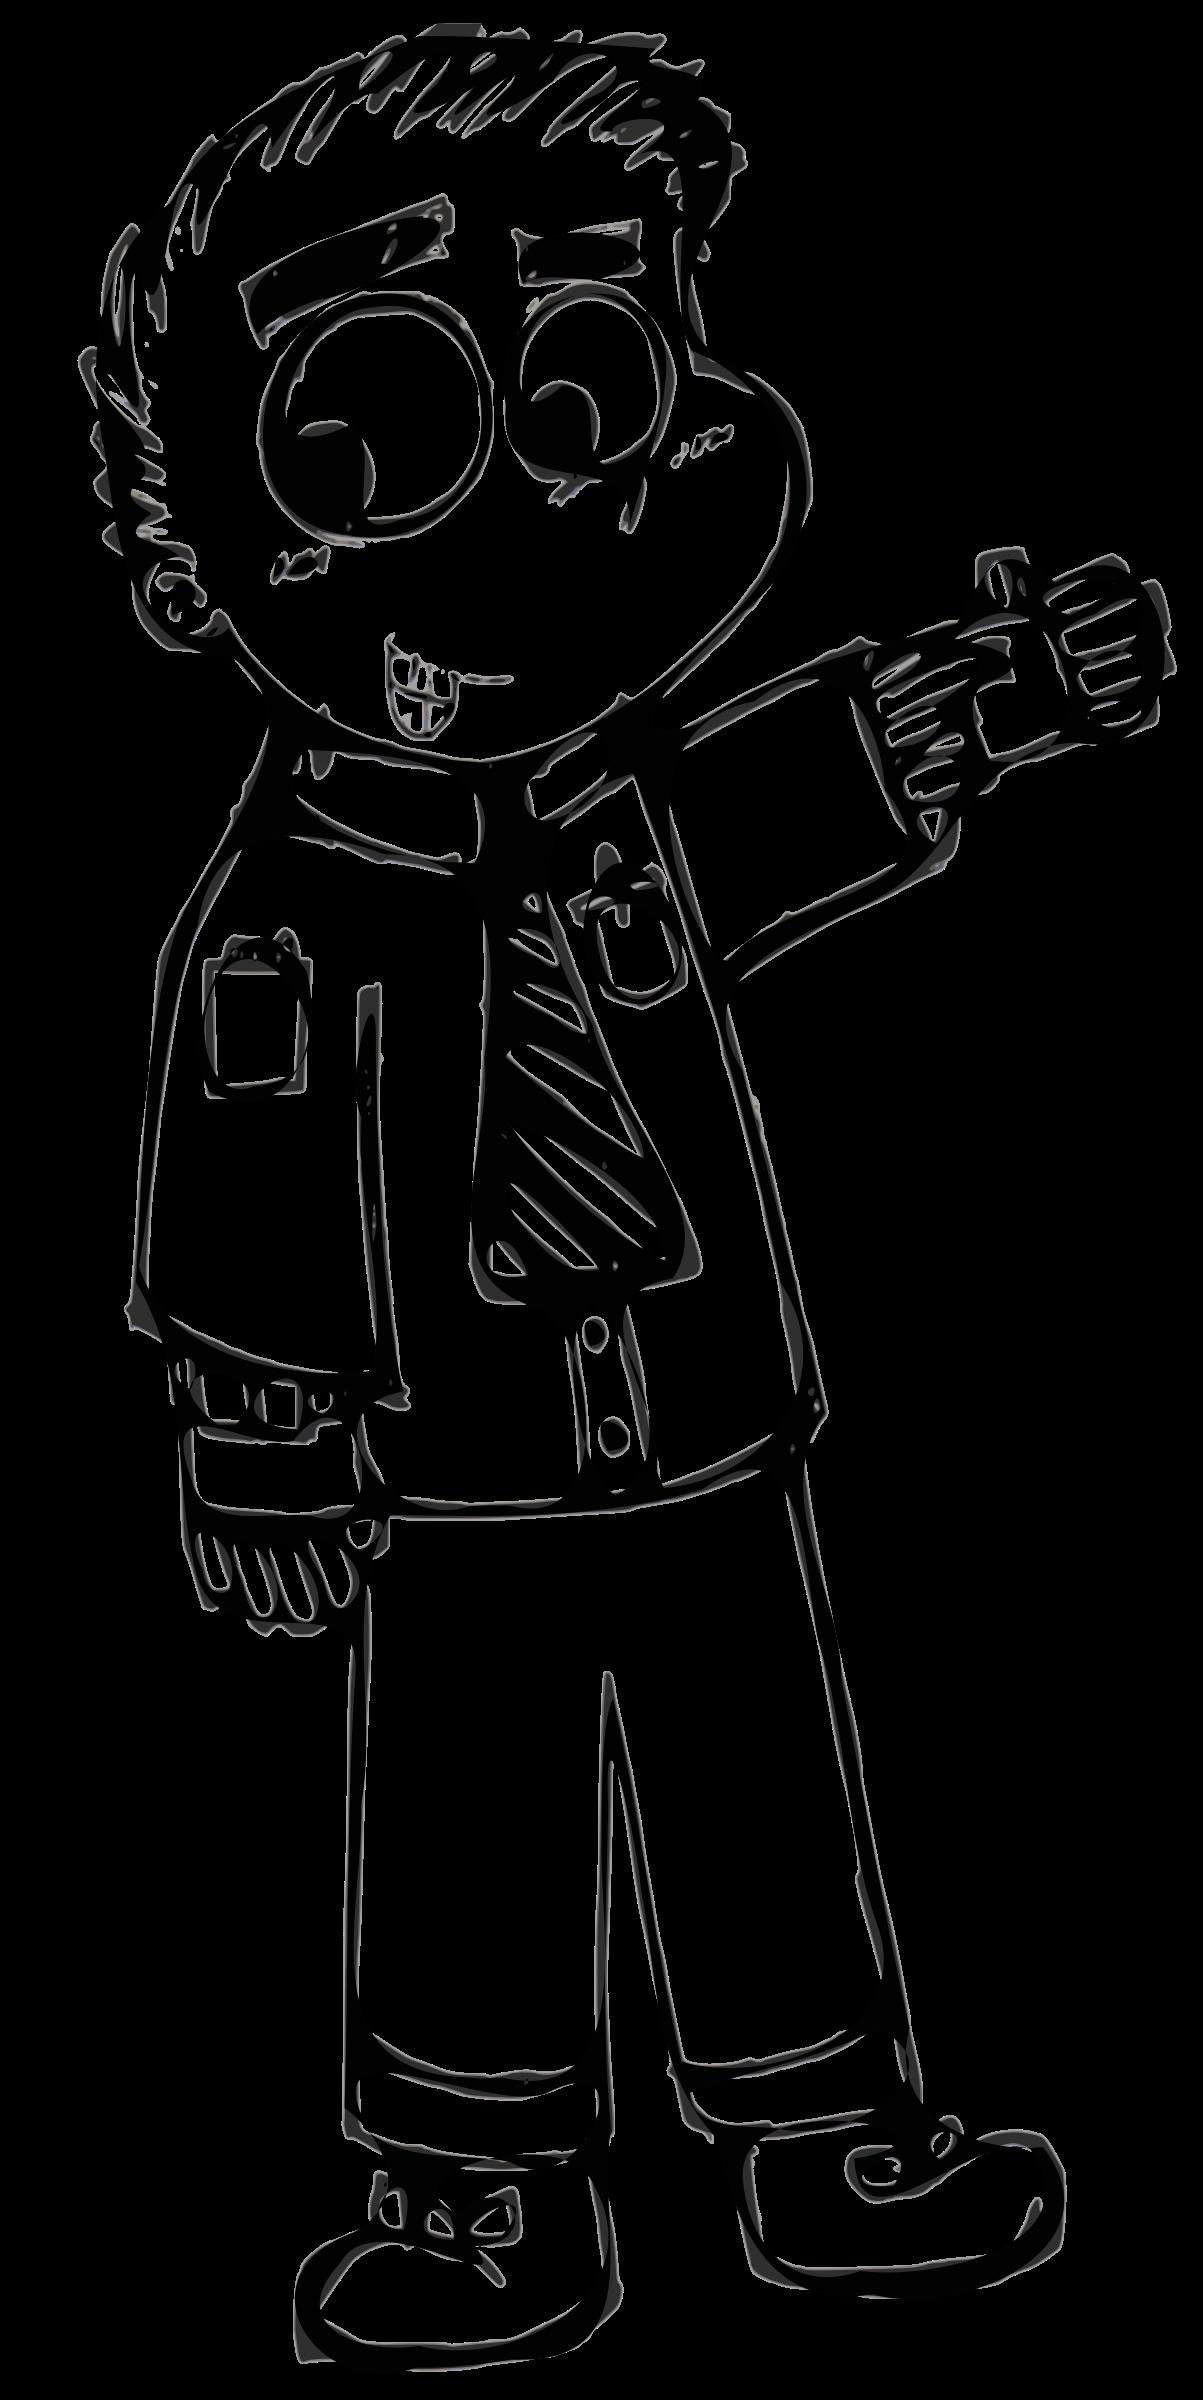 clip art transparent Man black and white clipart. Cartoon guy big image